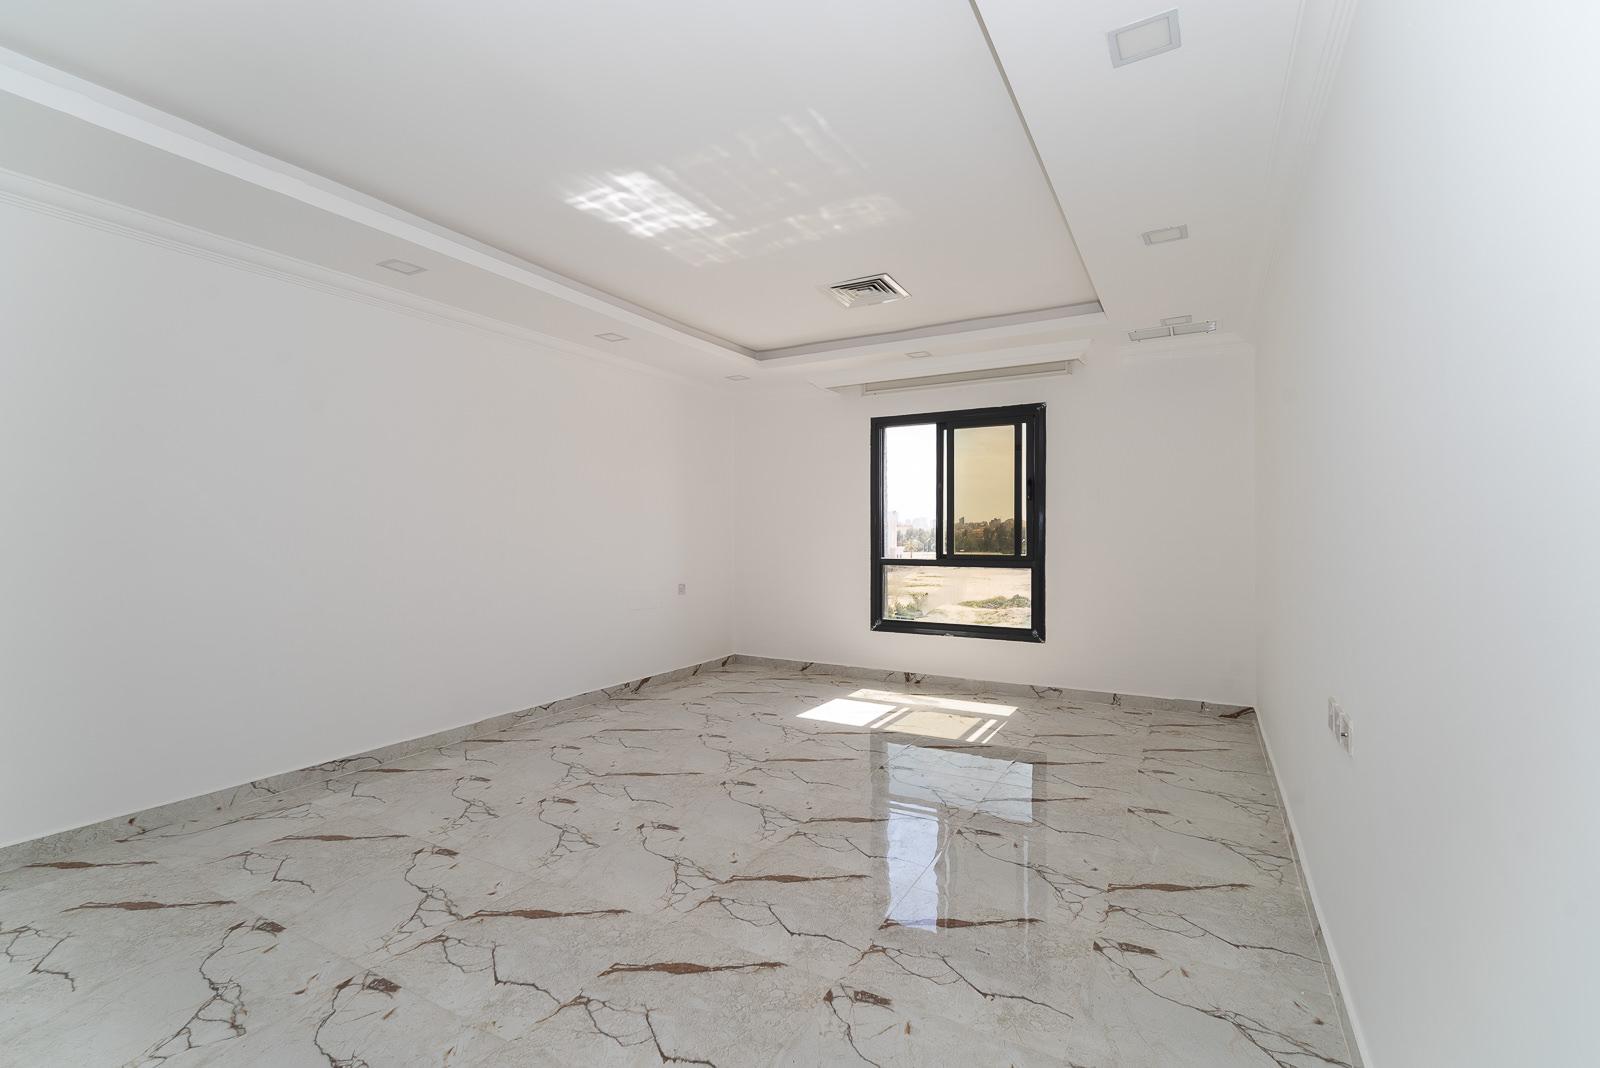 Egaila – new, unfurnished, three bedroom apartment